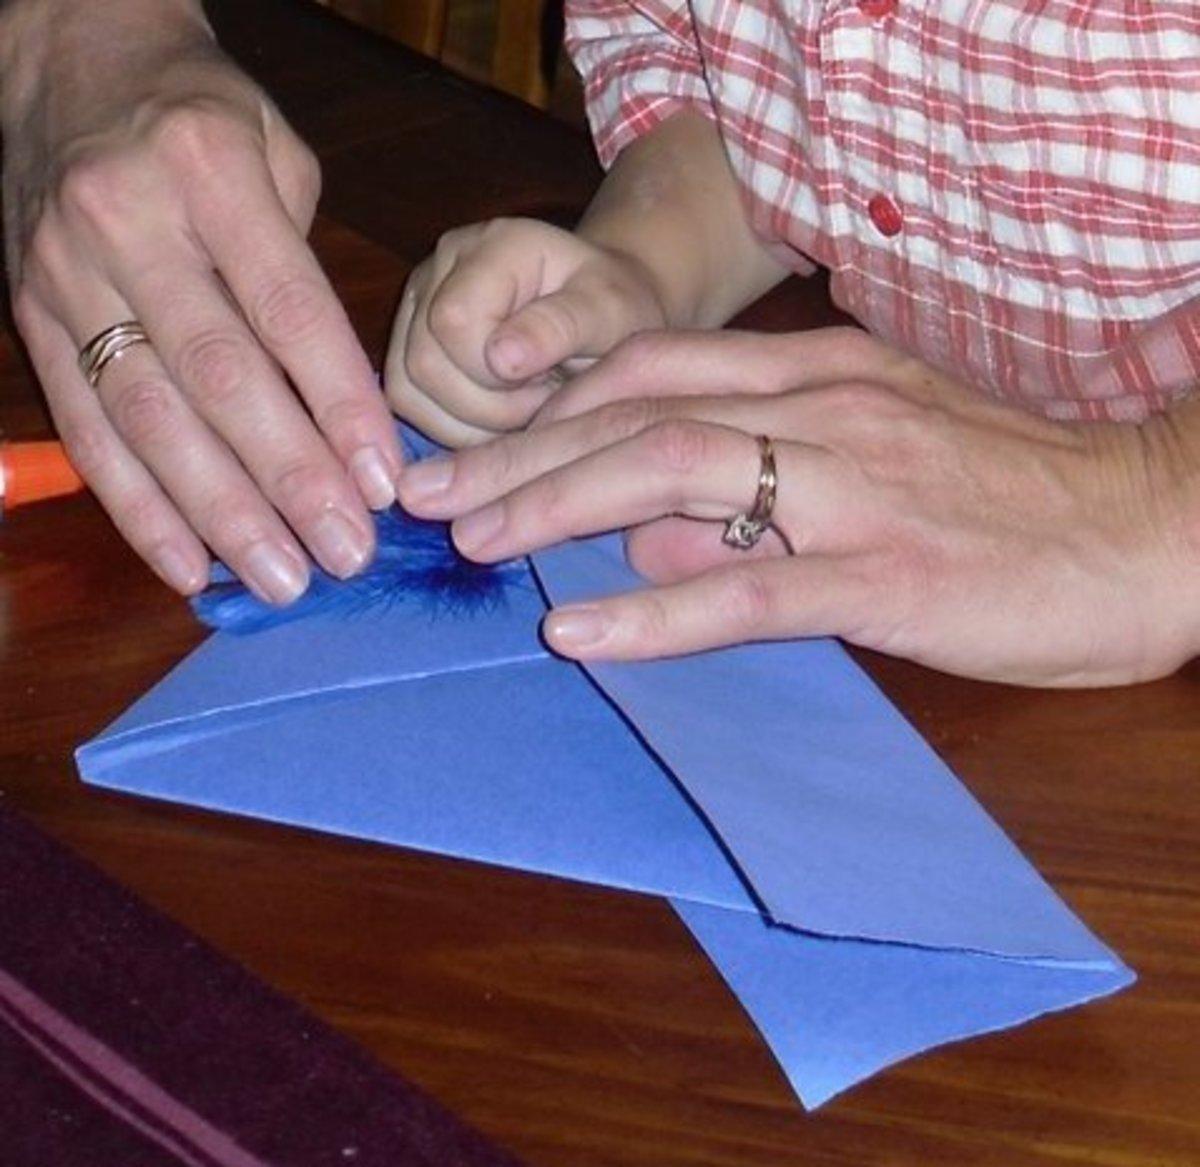 Folding the cavalier hat